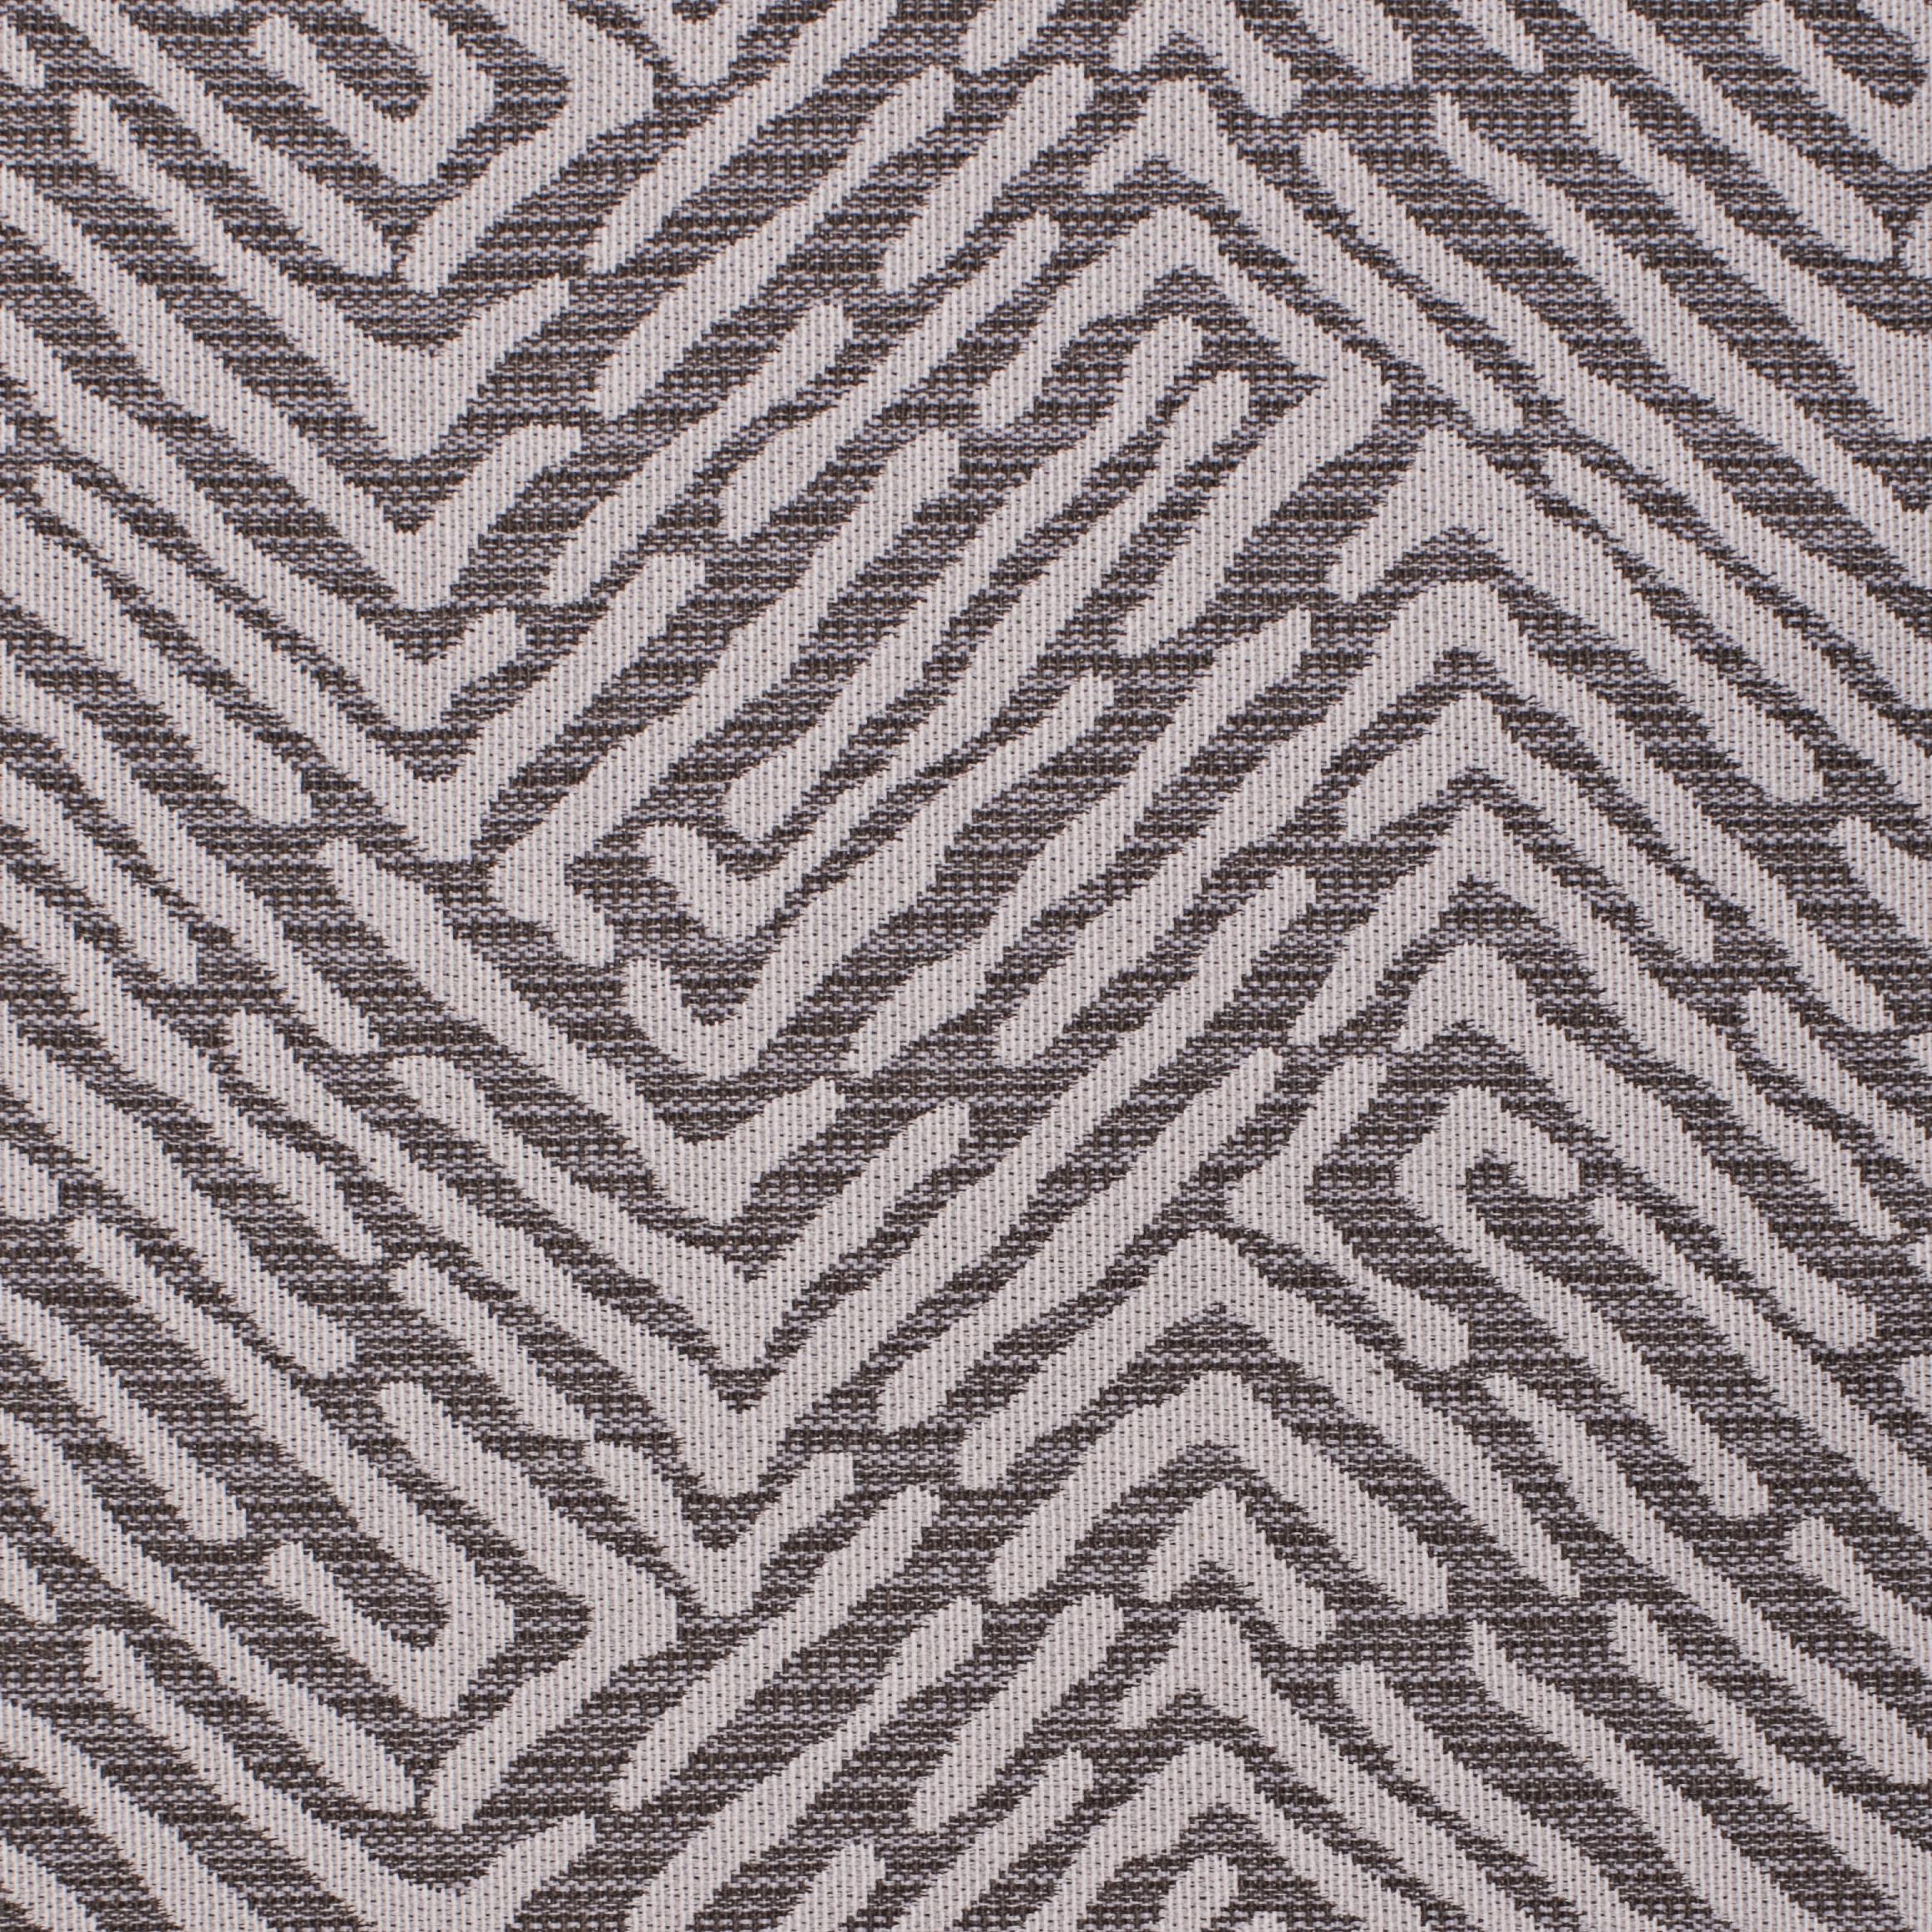 Randili Maze